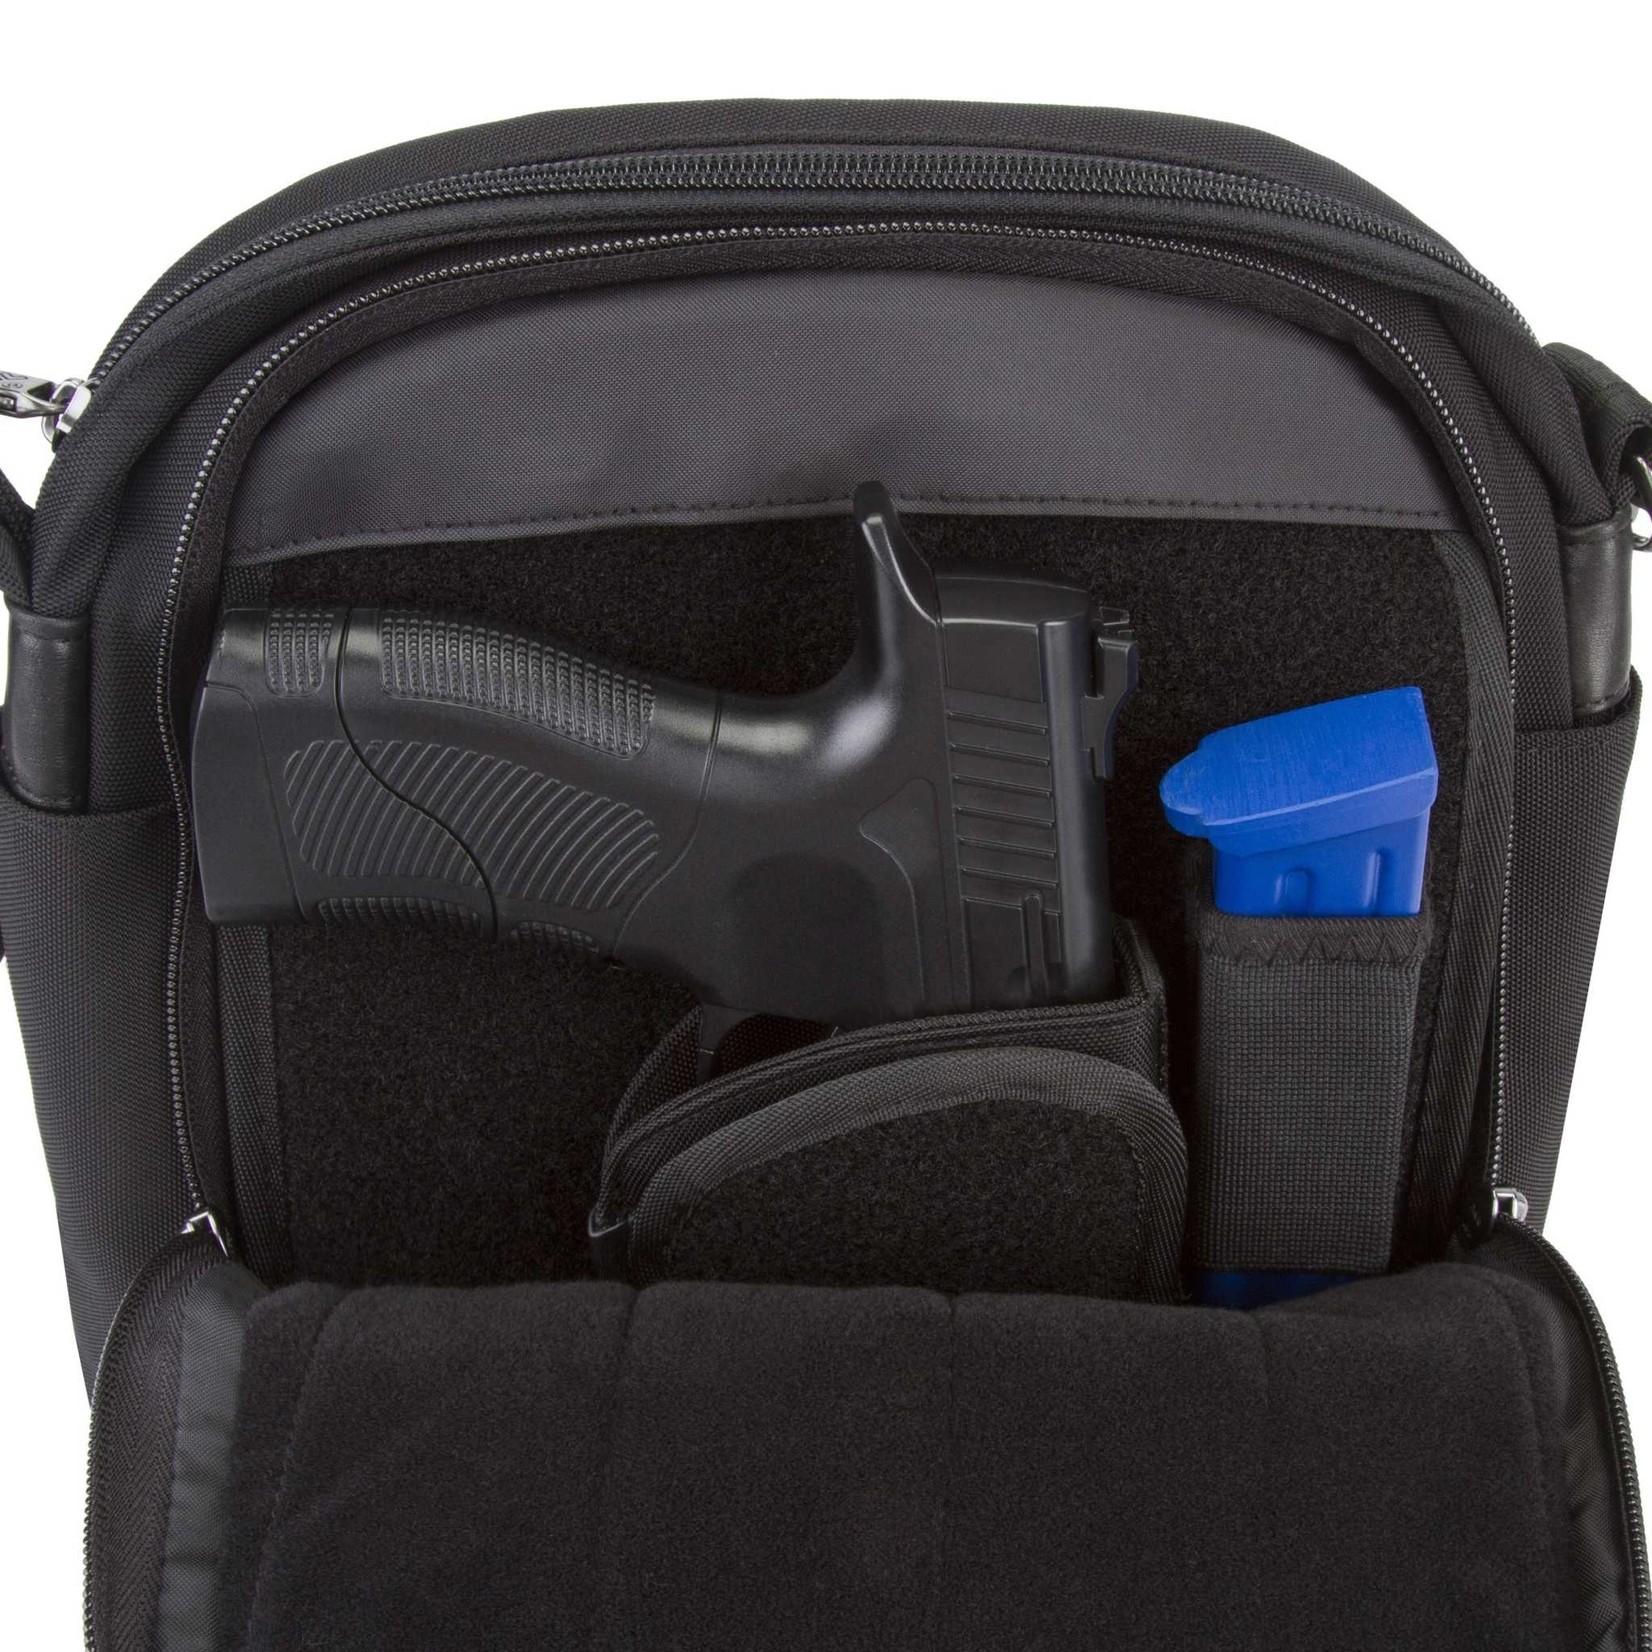 Travelon 43048-500-0060-01 AT Concealed Carry Tour Bag - Black